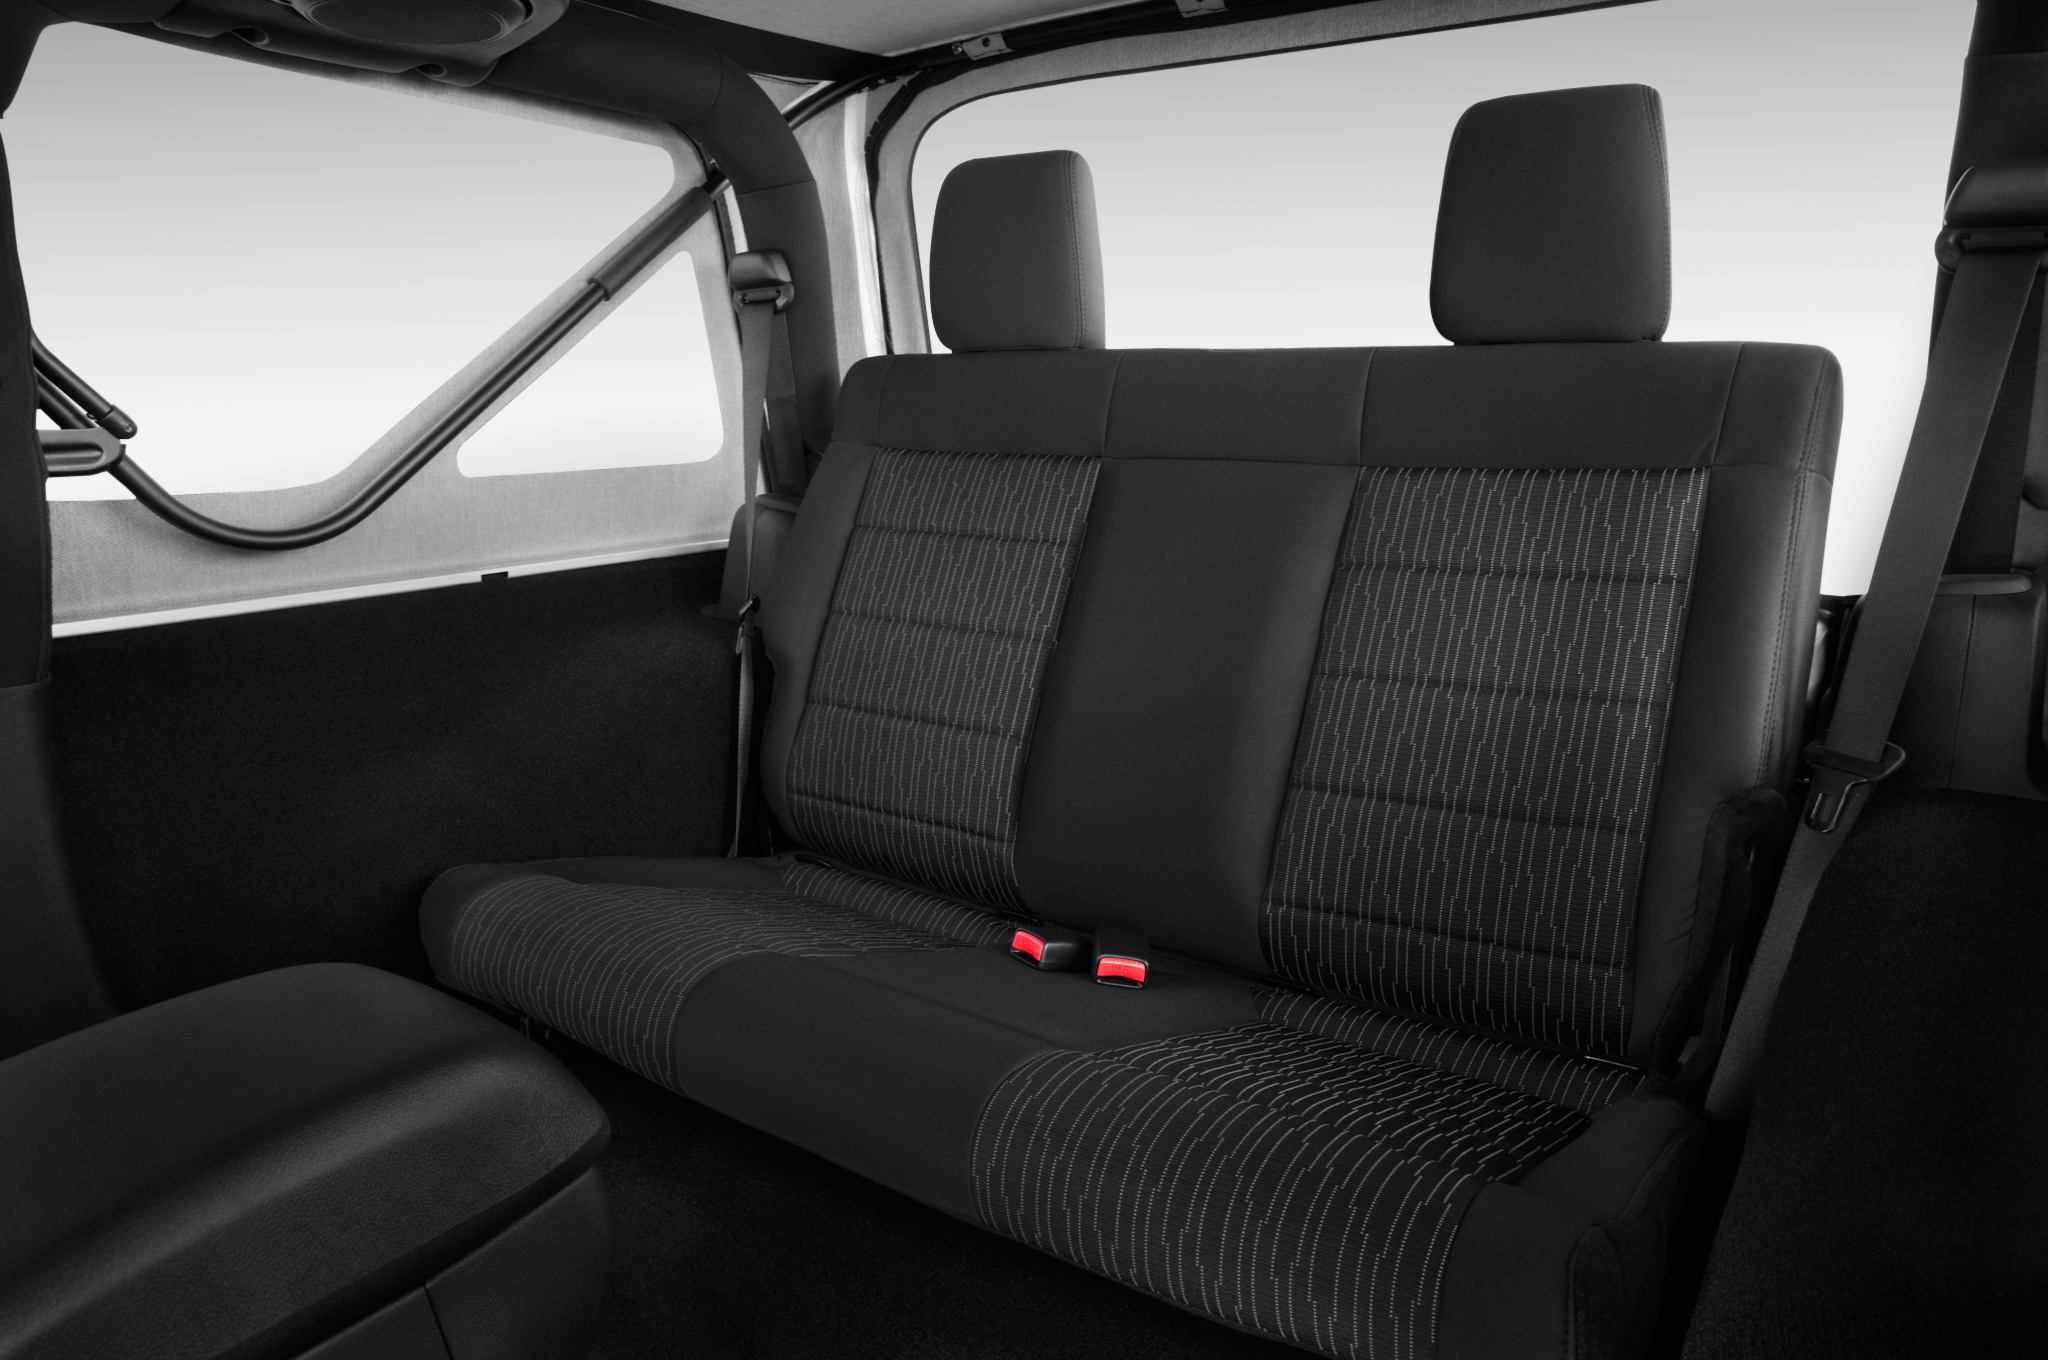 2018 jeep liberty interior. Brilliant Jeep 4244 With 2018 Jeep Liberty Interior L